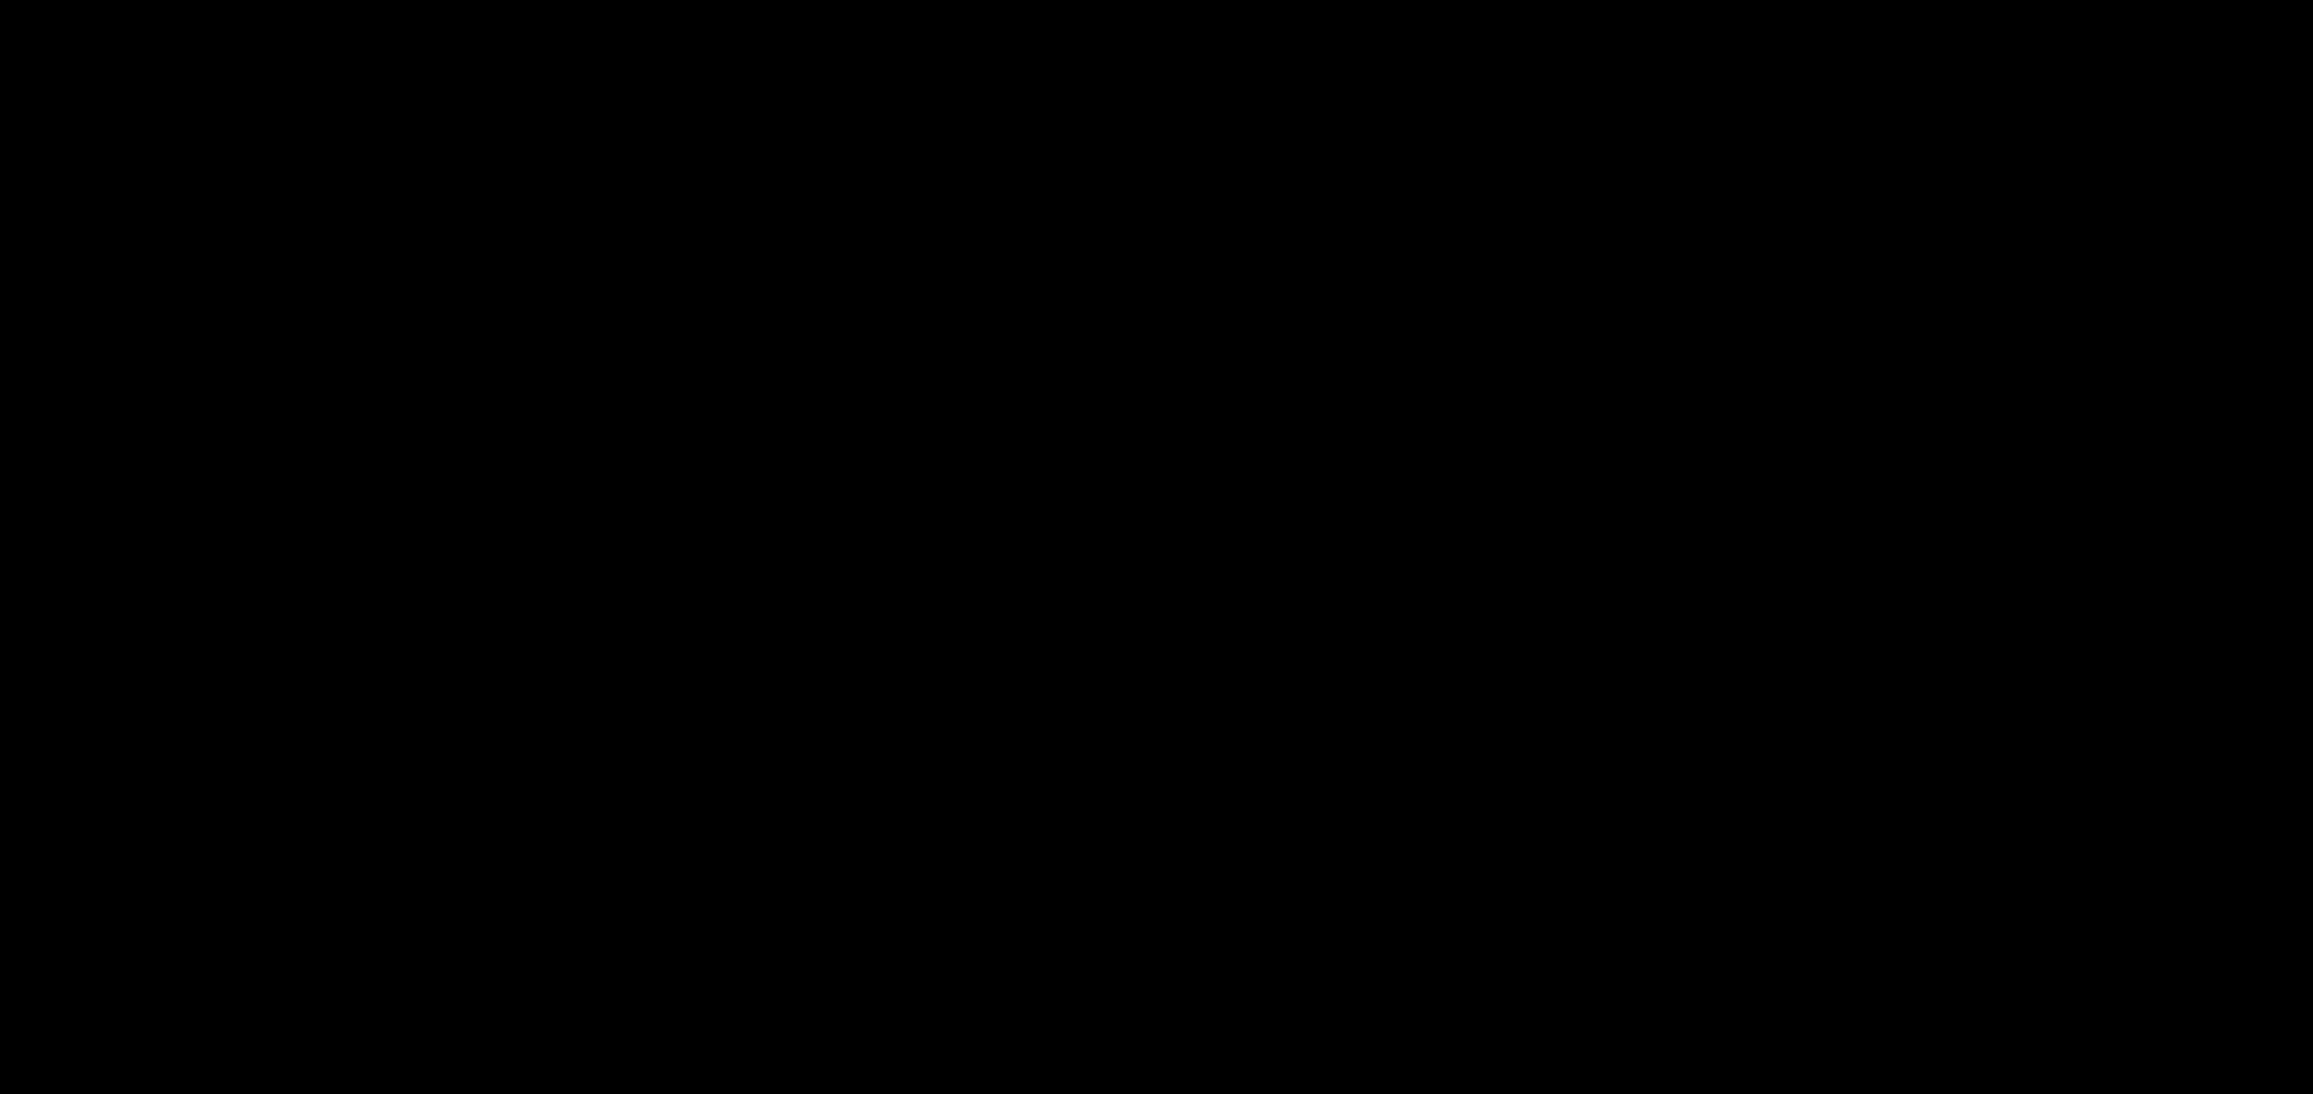 Flourish clipart basic. Simple big image png